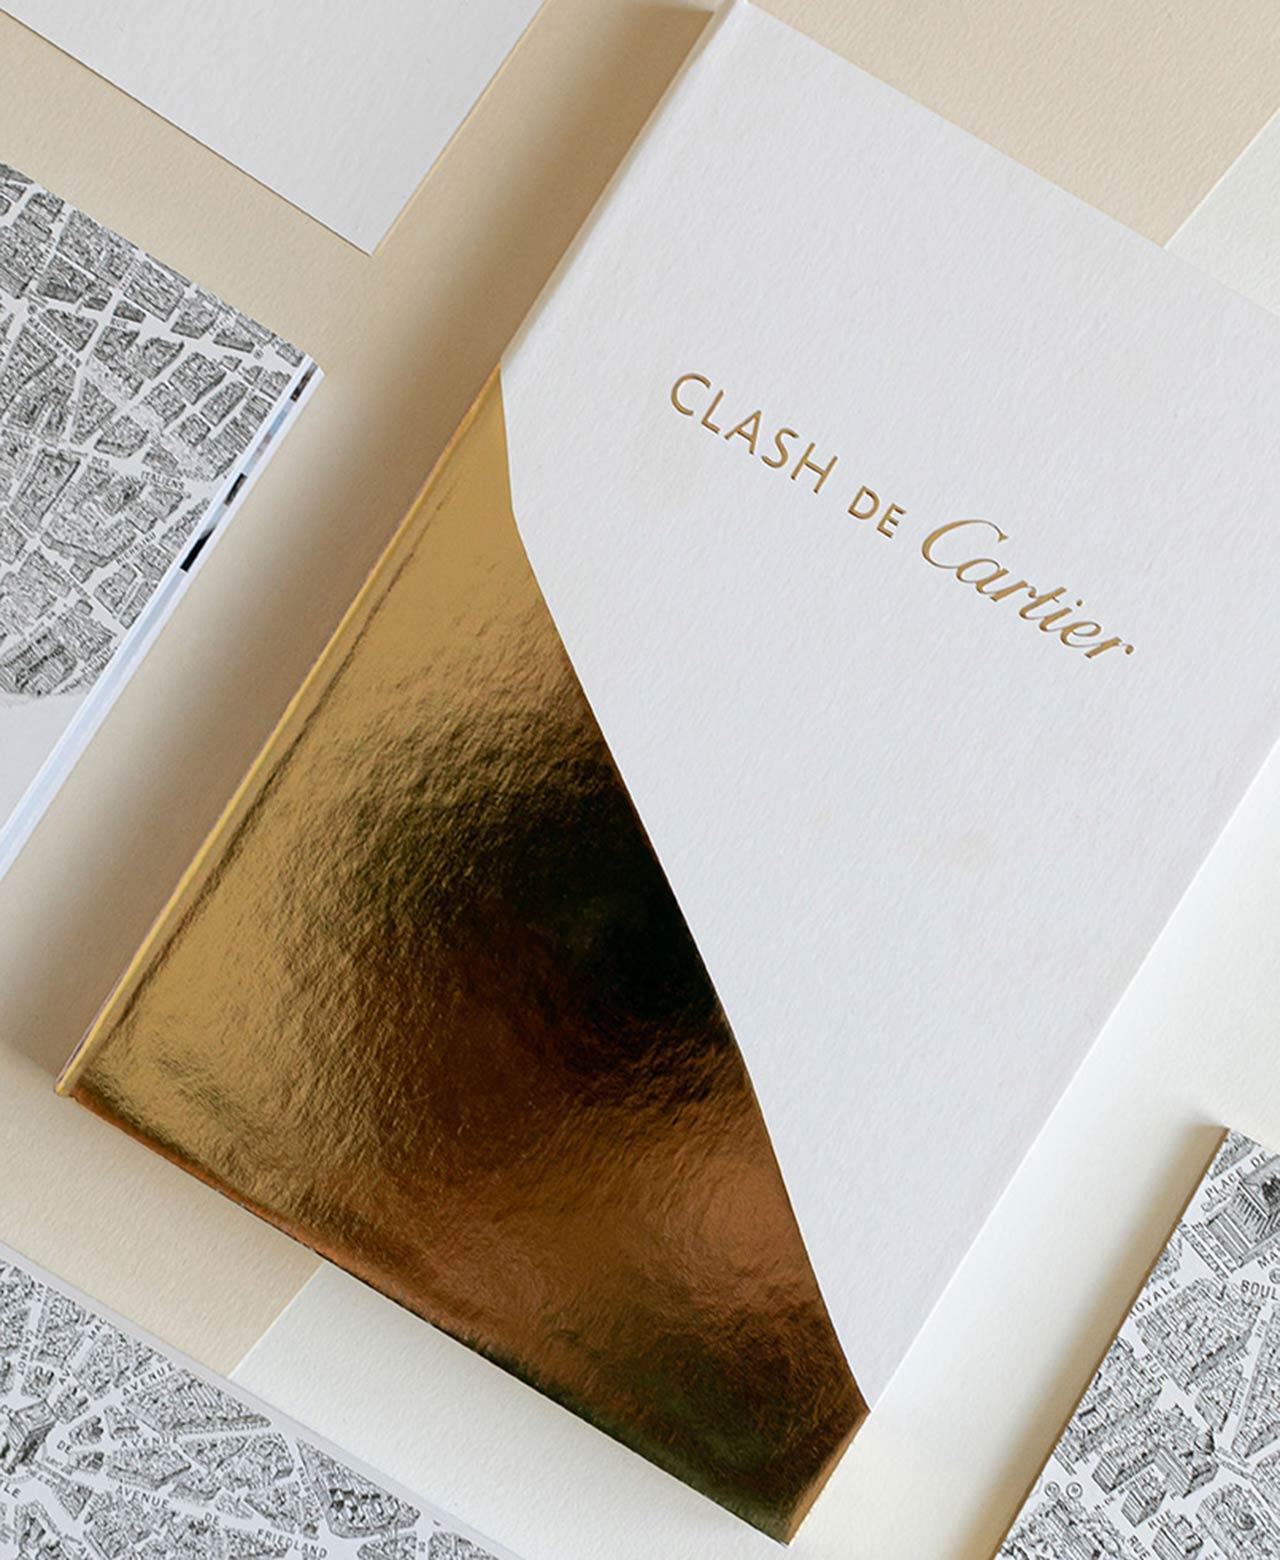 CartierClash-Thumb02-1280×1560